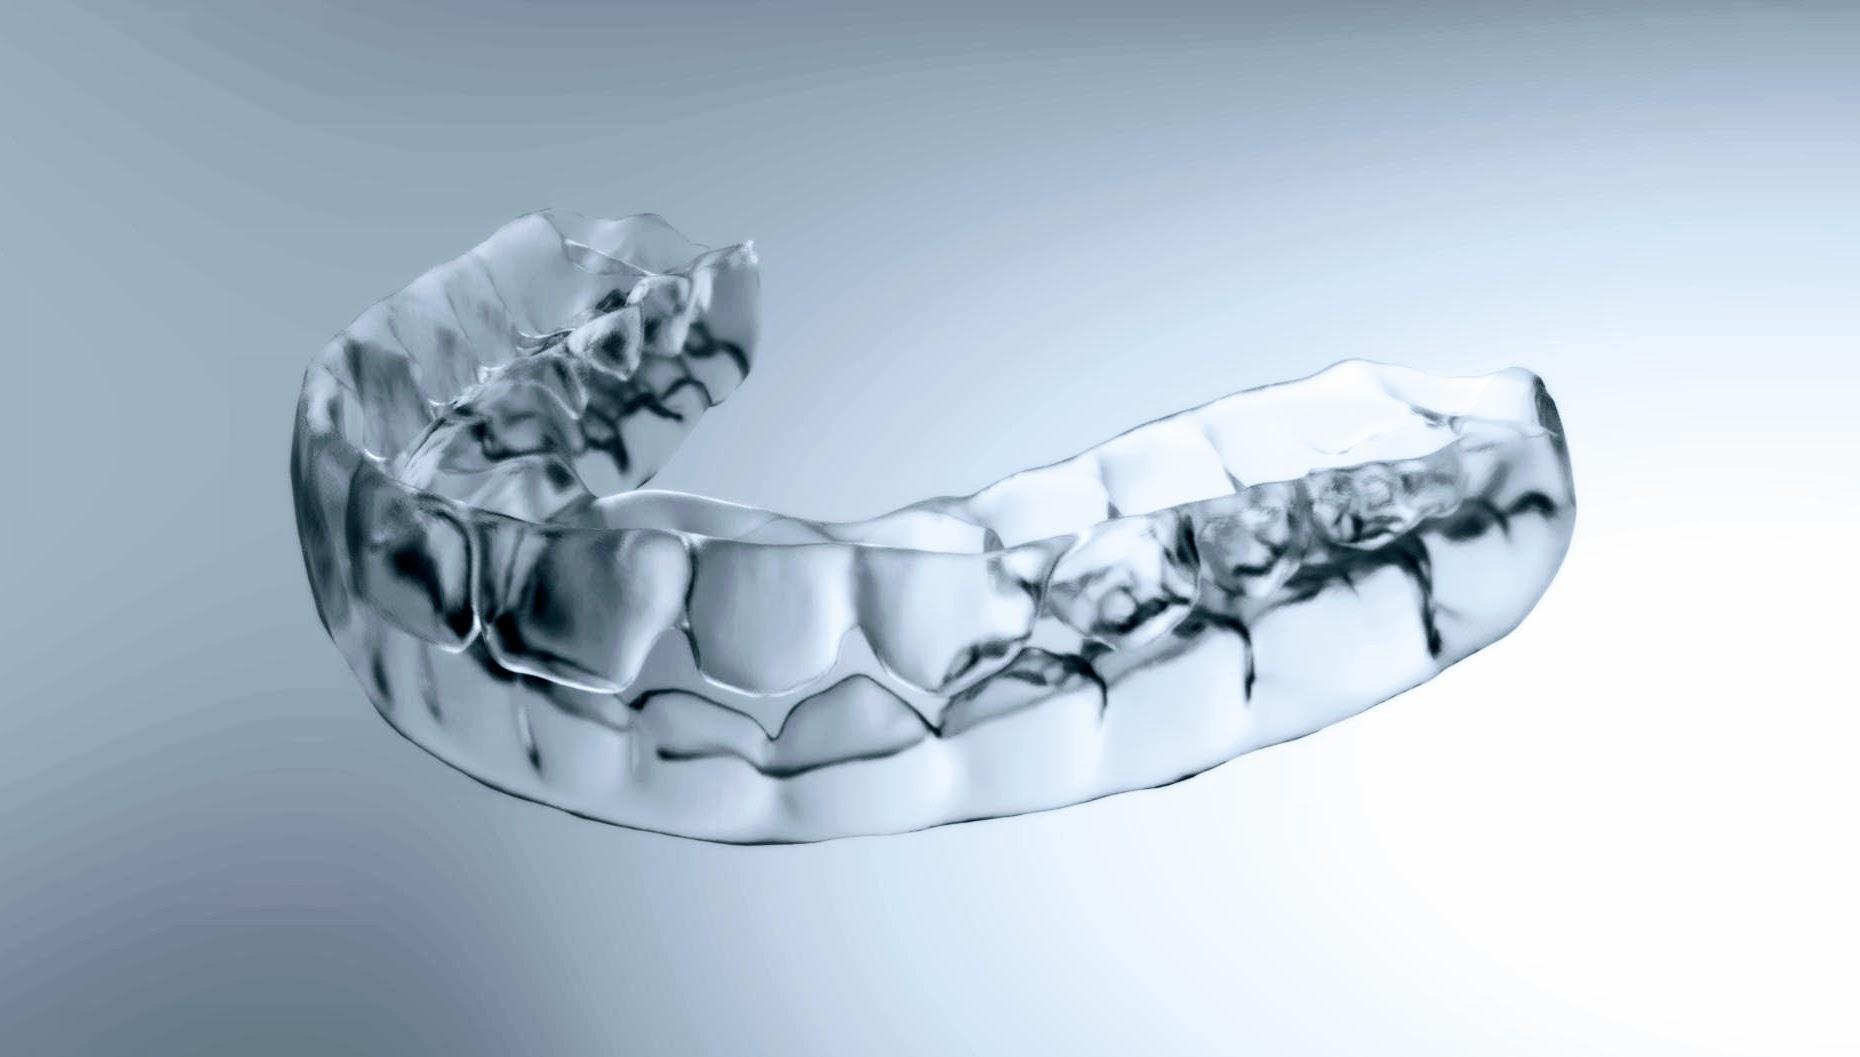 Tooth SimLab_26